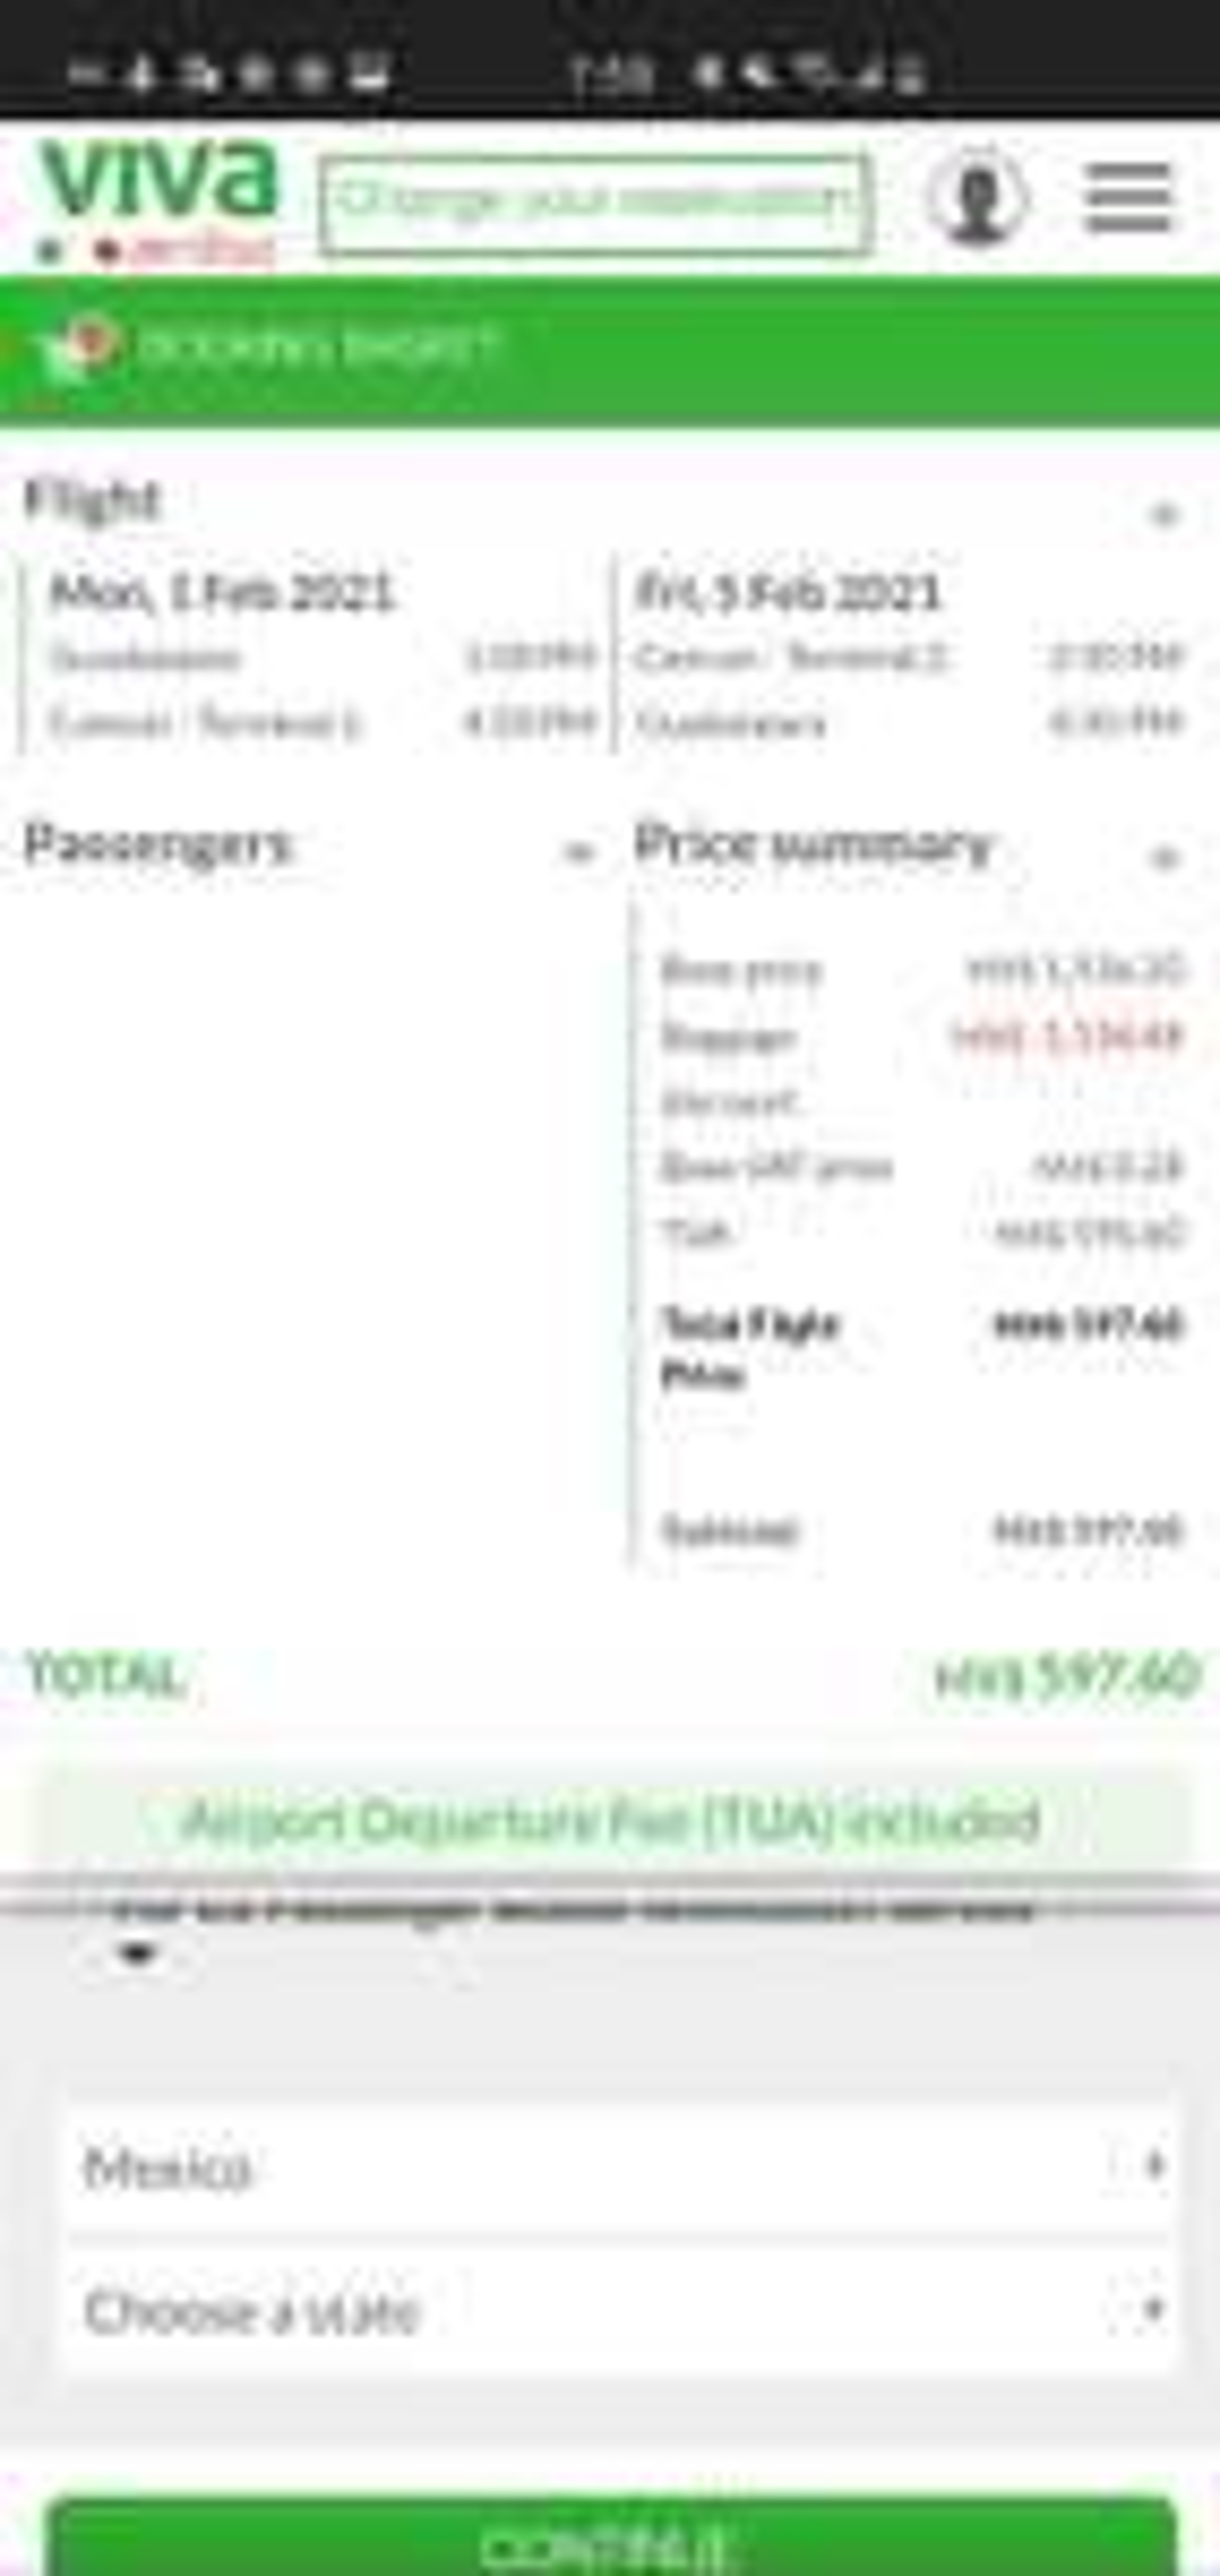 VivaAerobus vuelo redondo Gdl-Cancun (varias fechas) (incluye TUA)